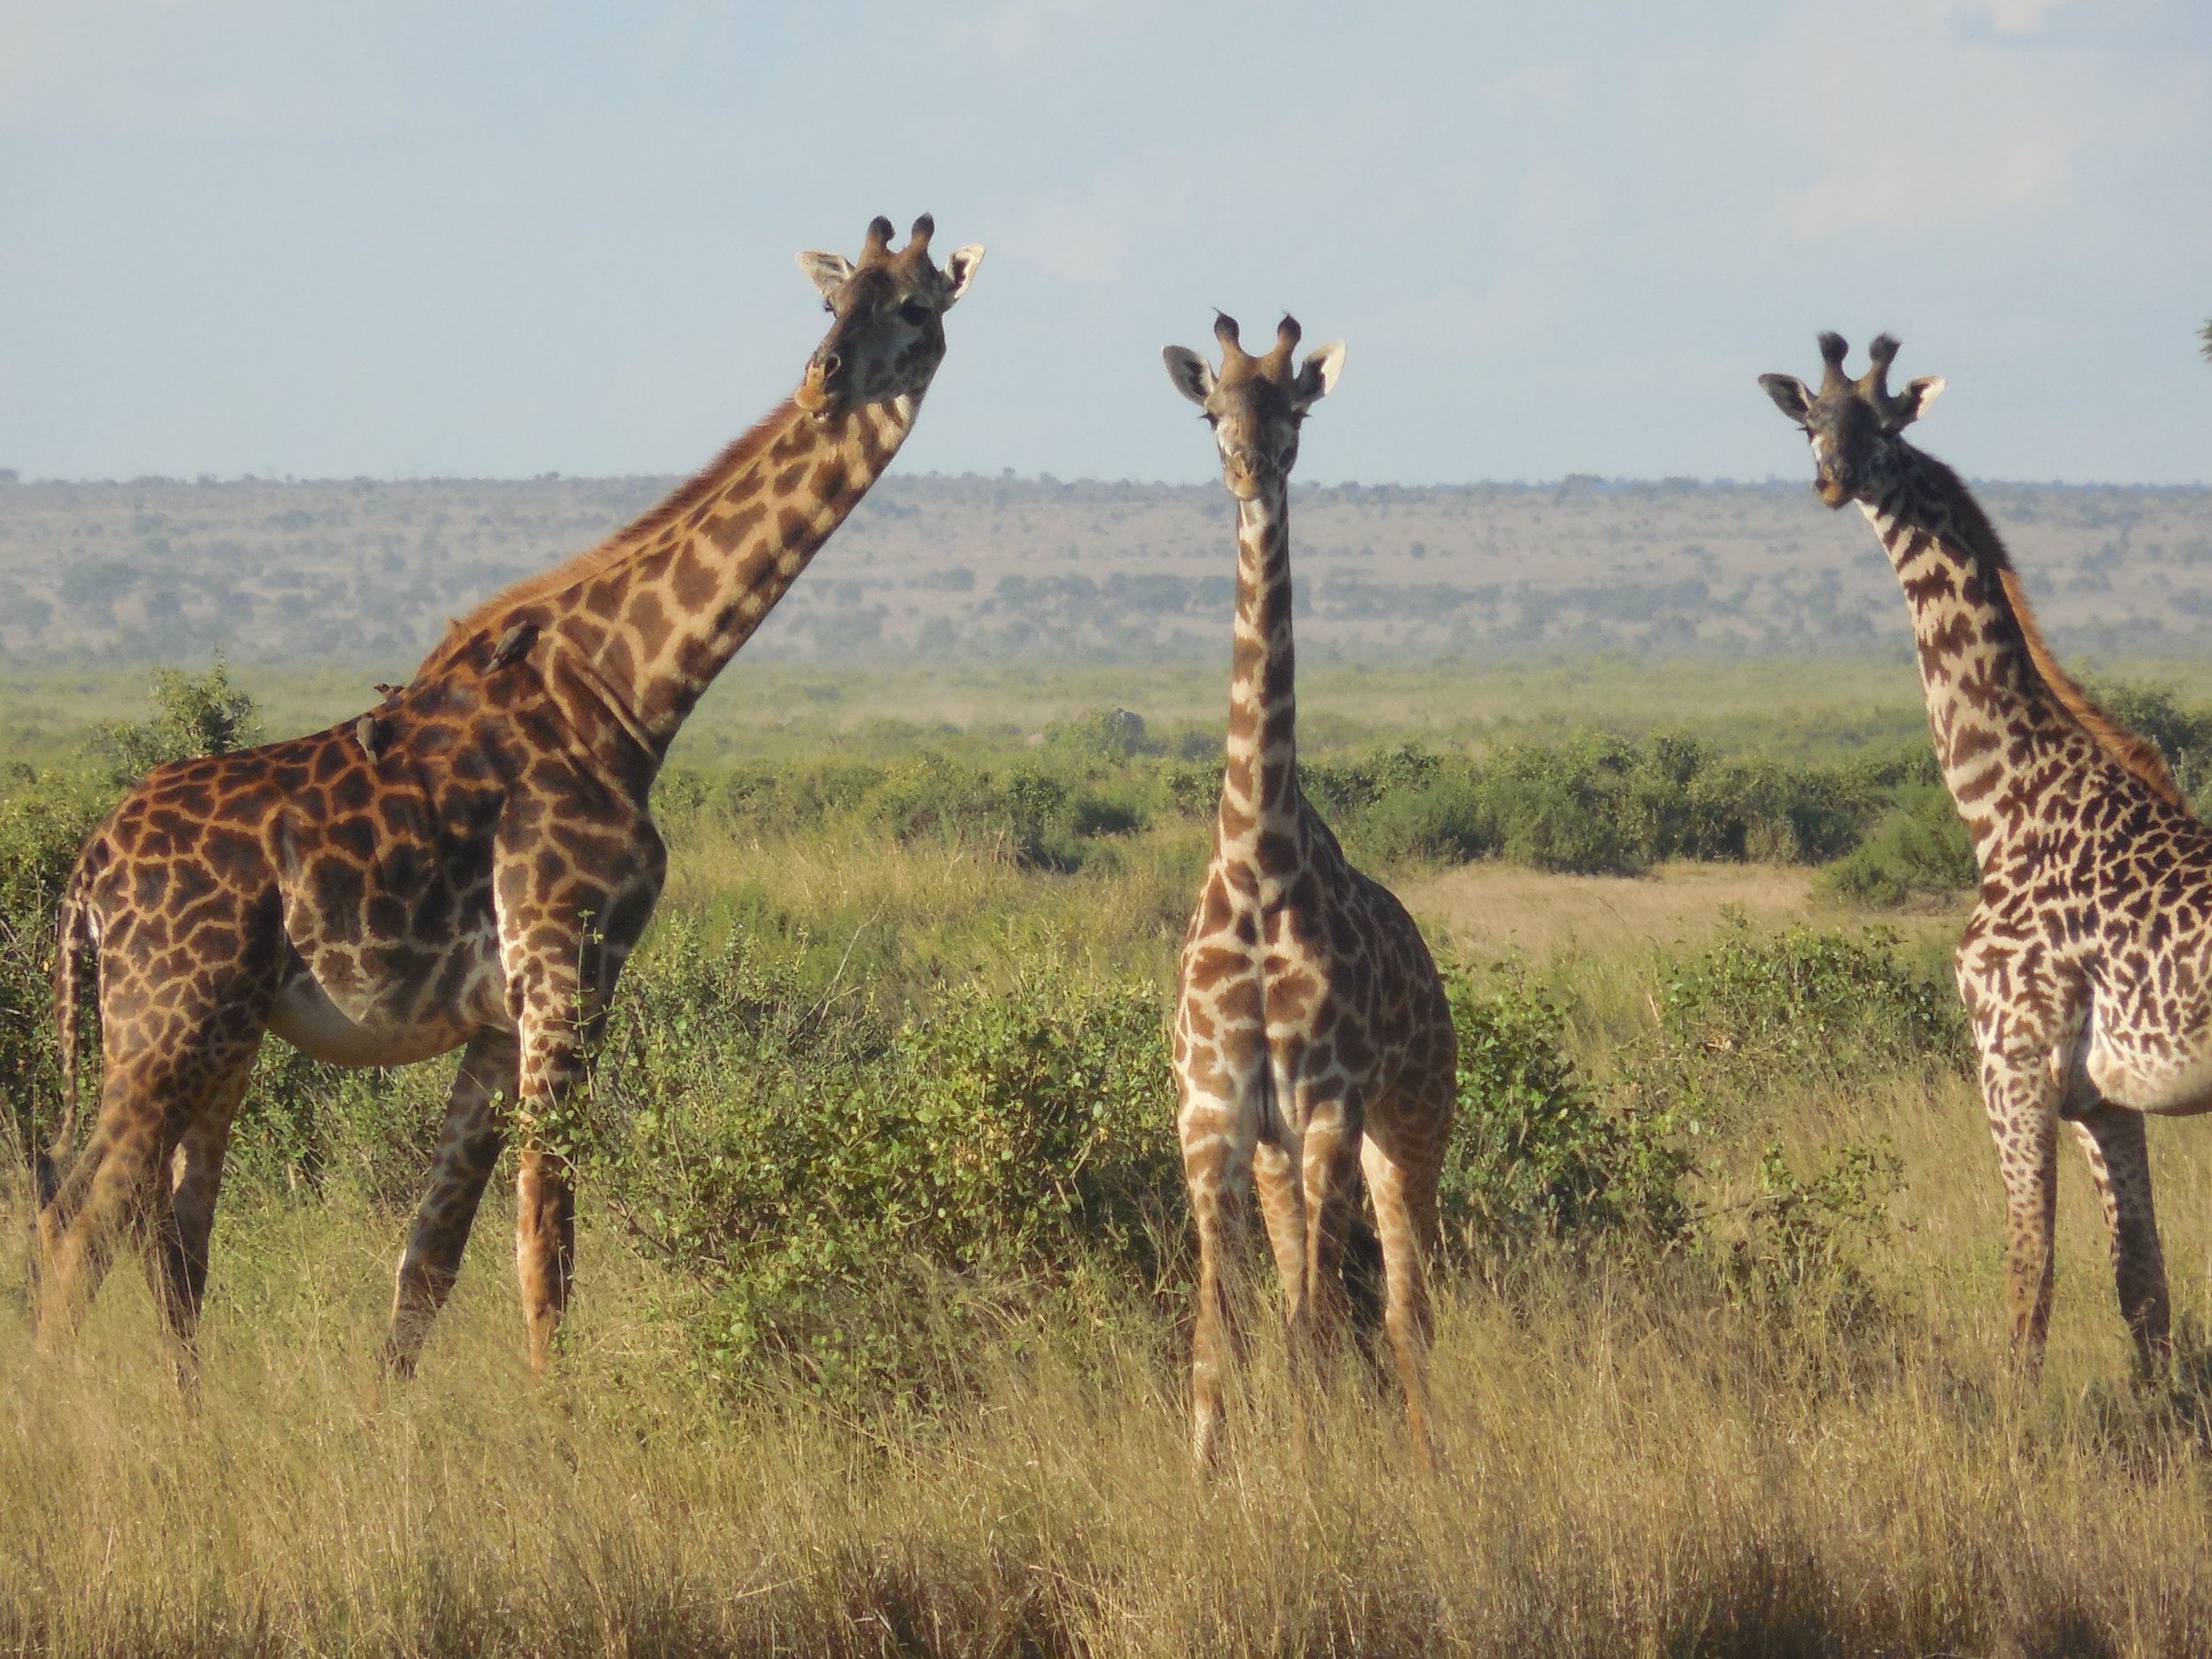 Twiga Kenya © Flyga Twiga LLC